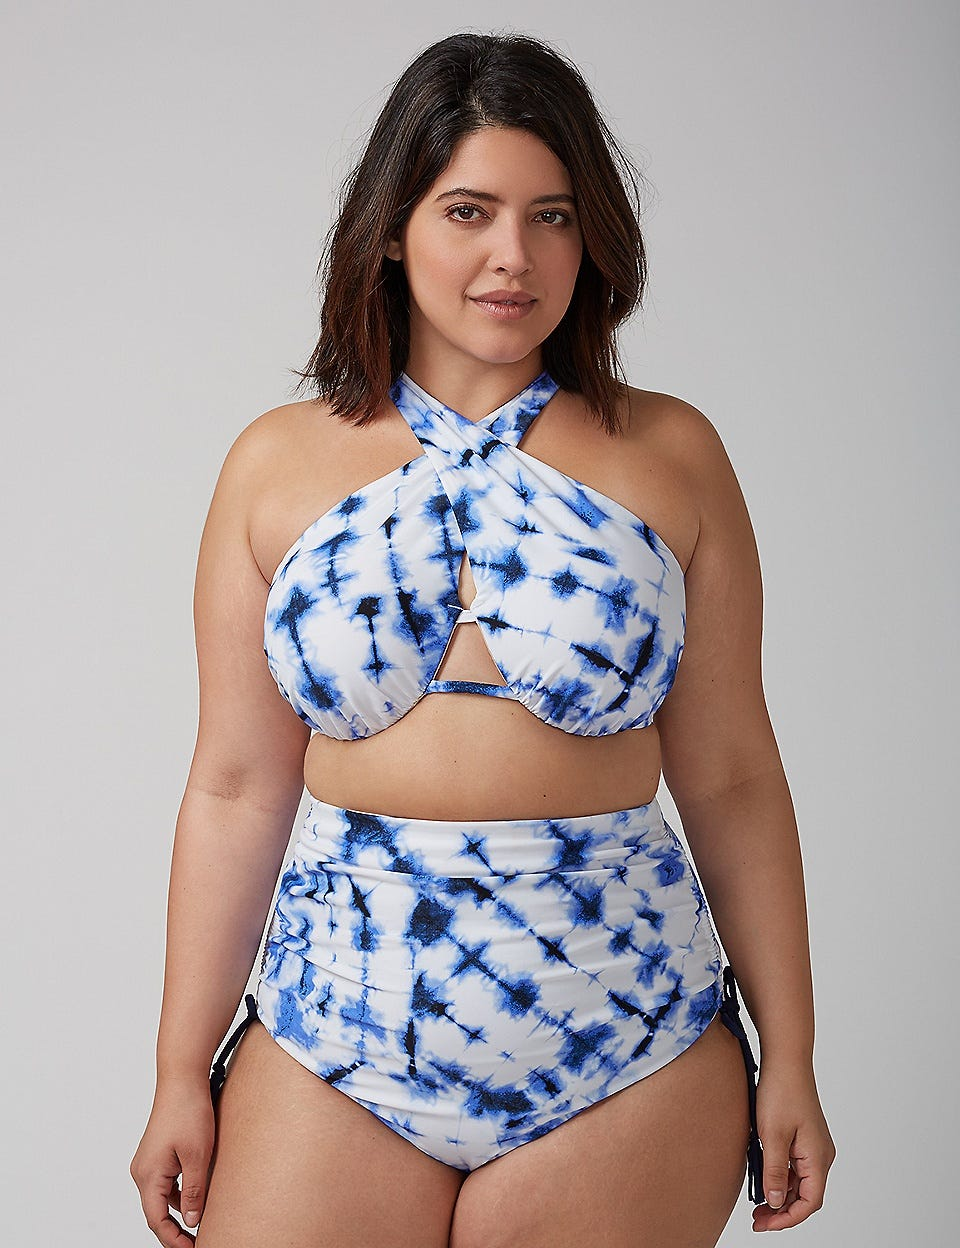 What kind of bikini should a D-cup girl wear?